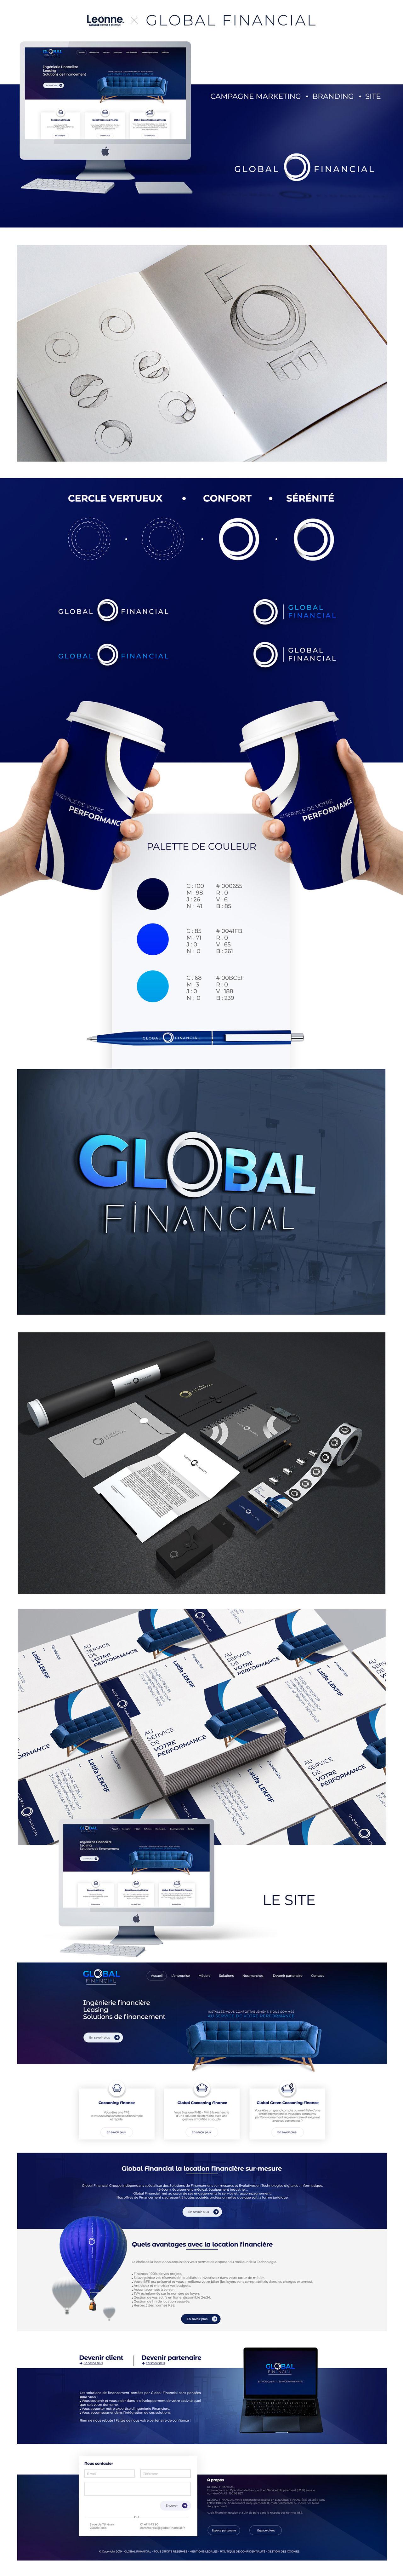 GLOBAL FINANCIAL – CAMPAGNE MARKETING DIGITAL